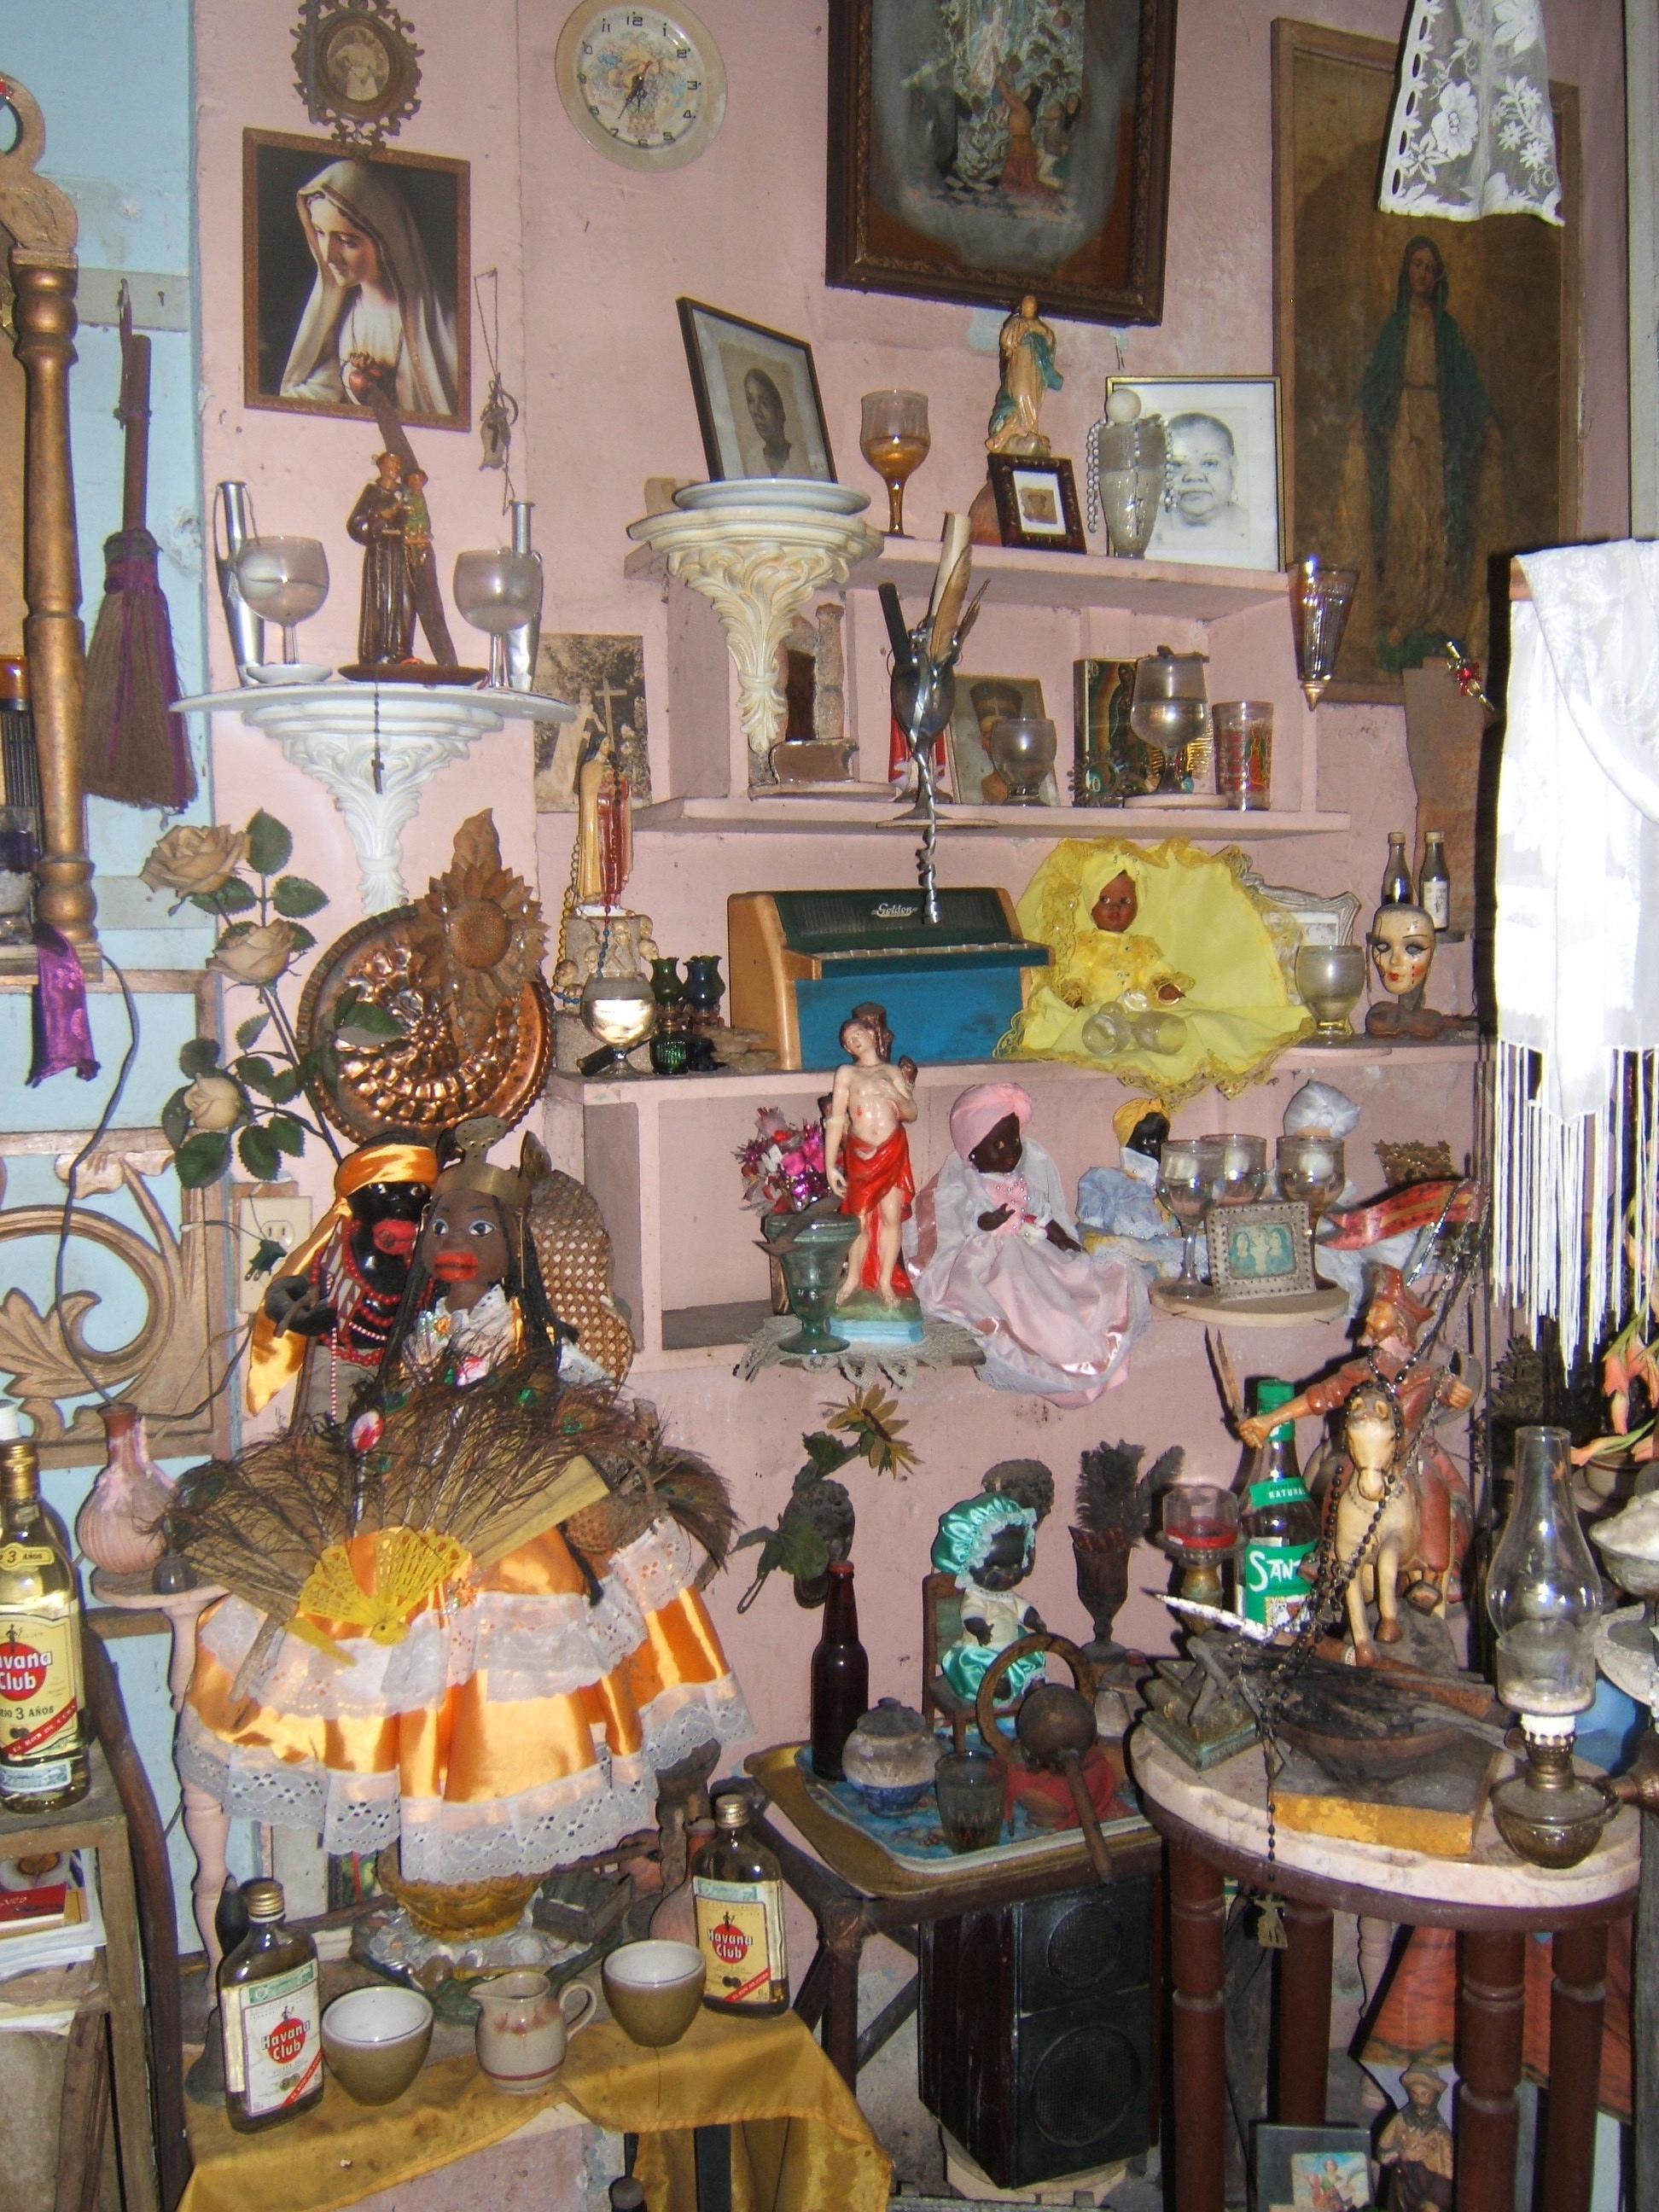 Figure 8. Another view of Pedro's altar. Photograph by author. Santiago de Cuba, August 2008. Photograph by author.